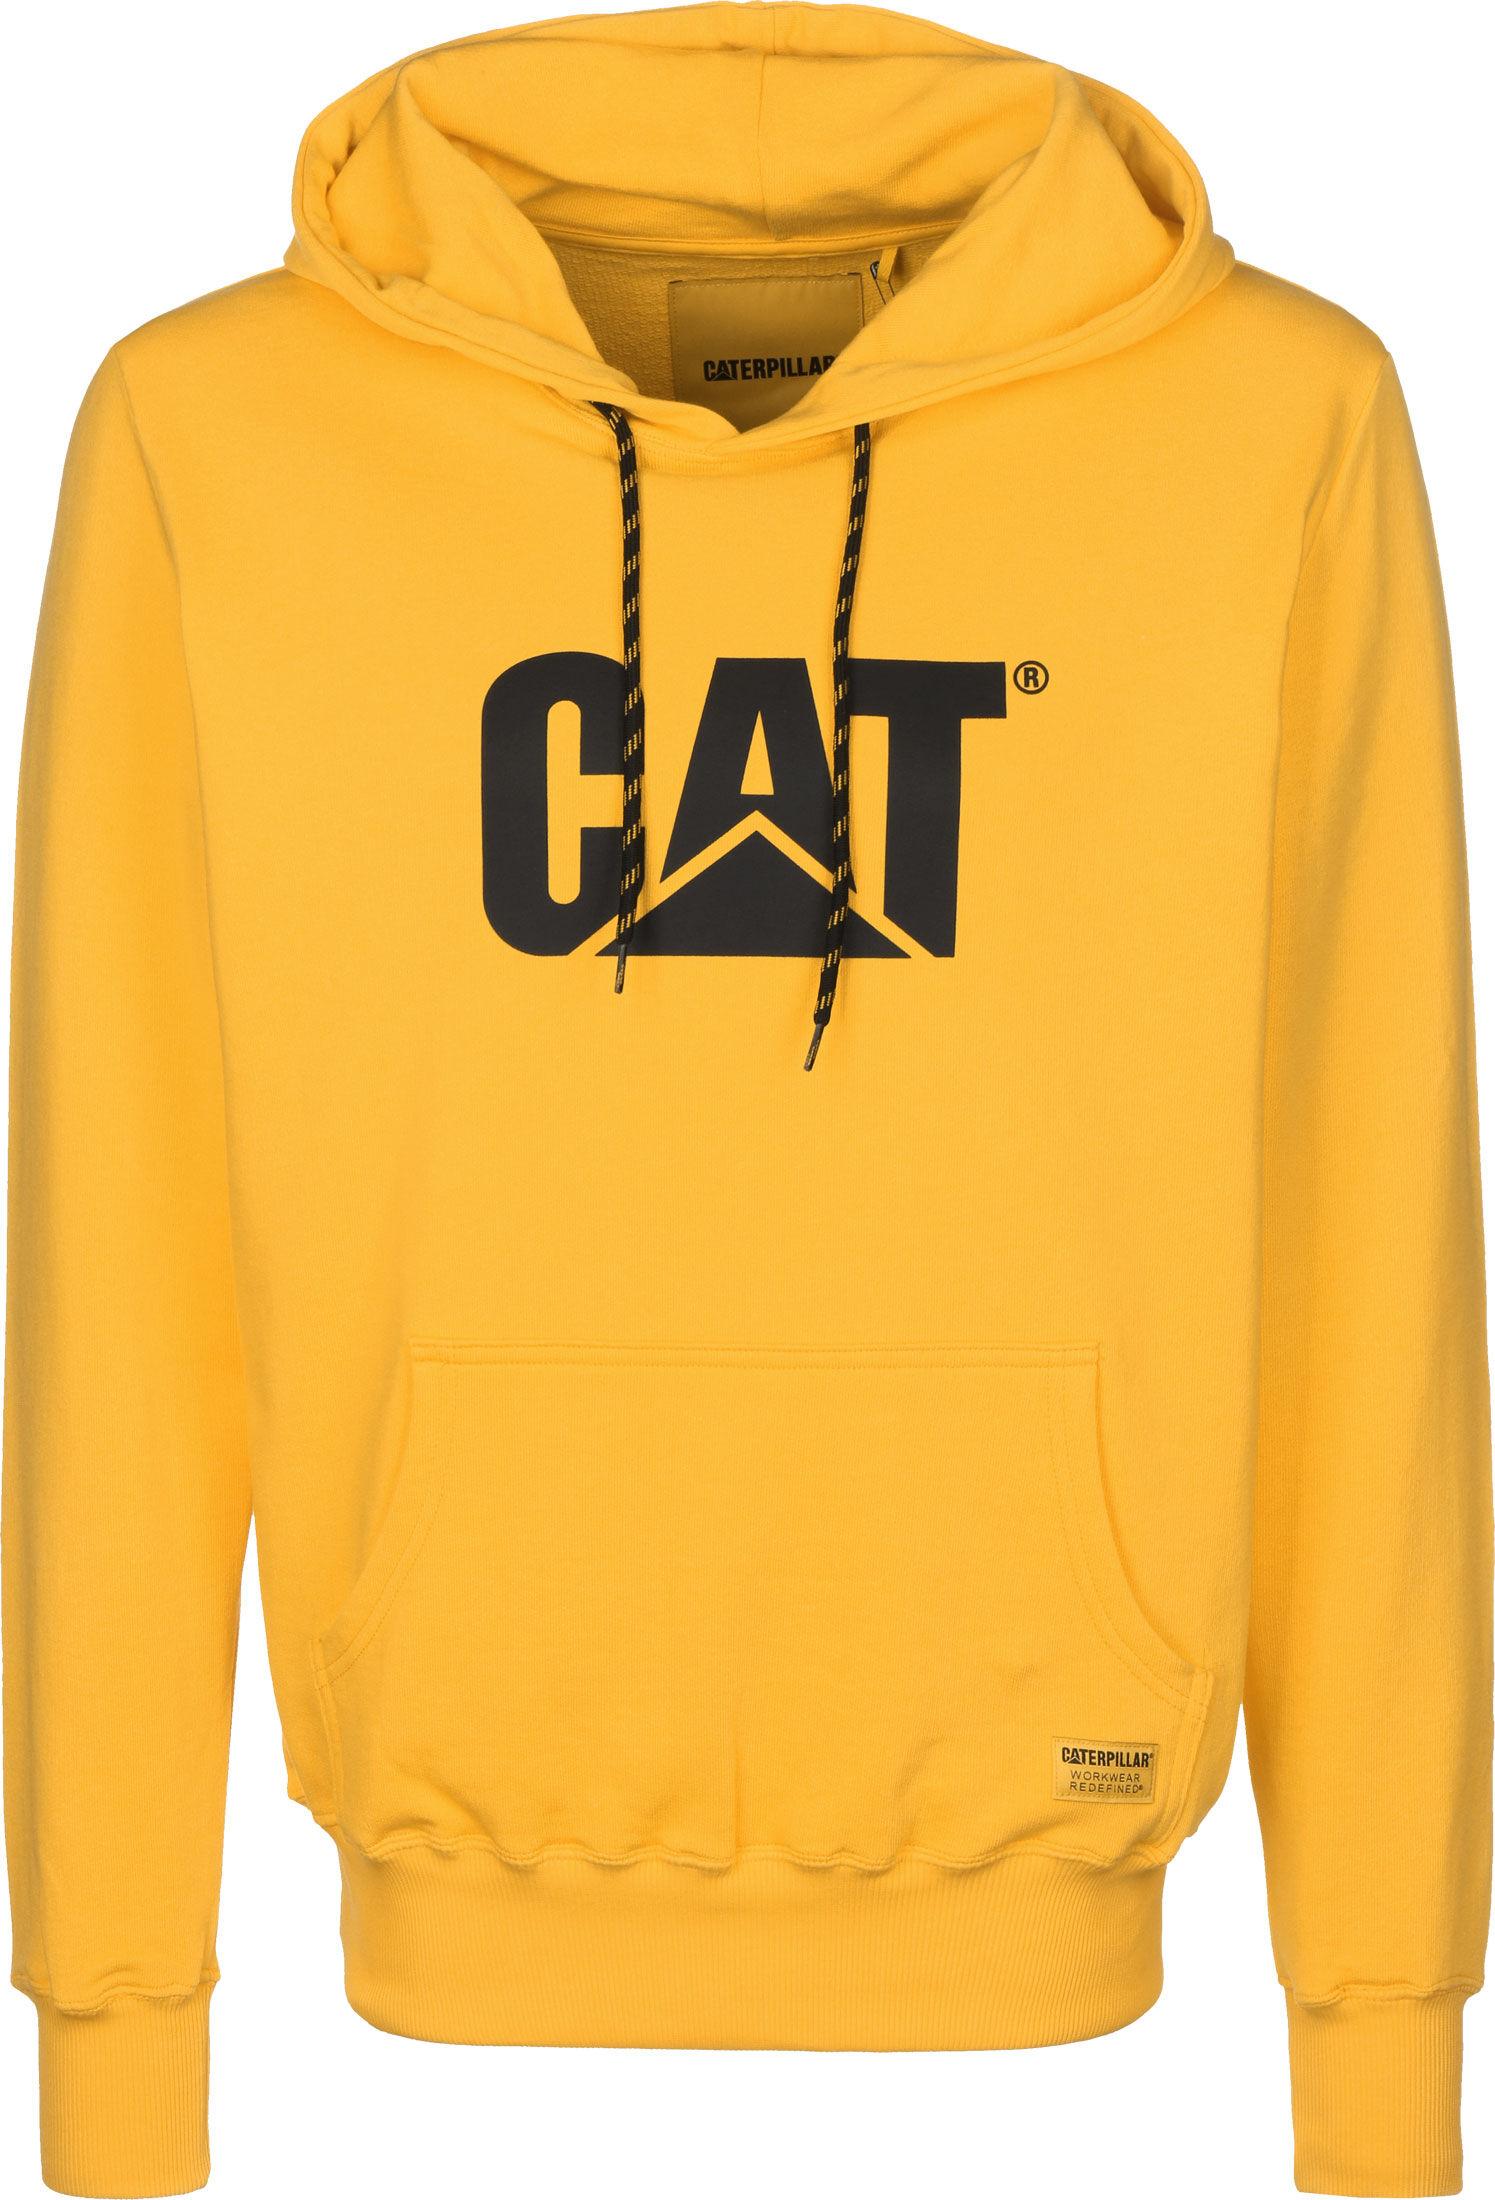 Caterpillar Cat Smal Logo Hoodies bij Stylefile